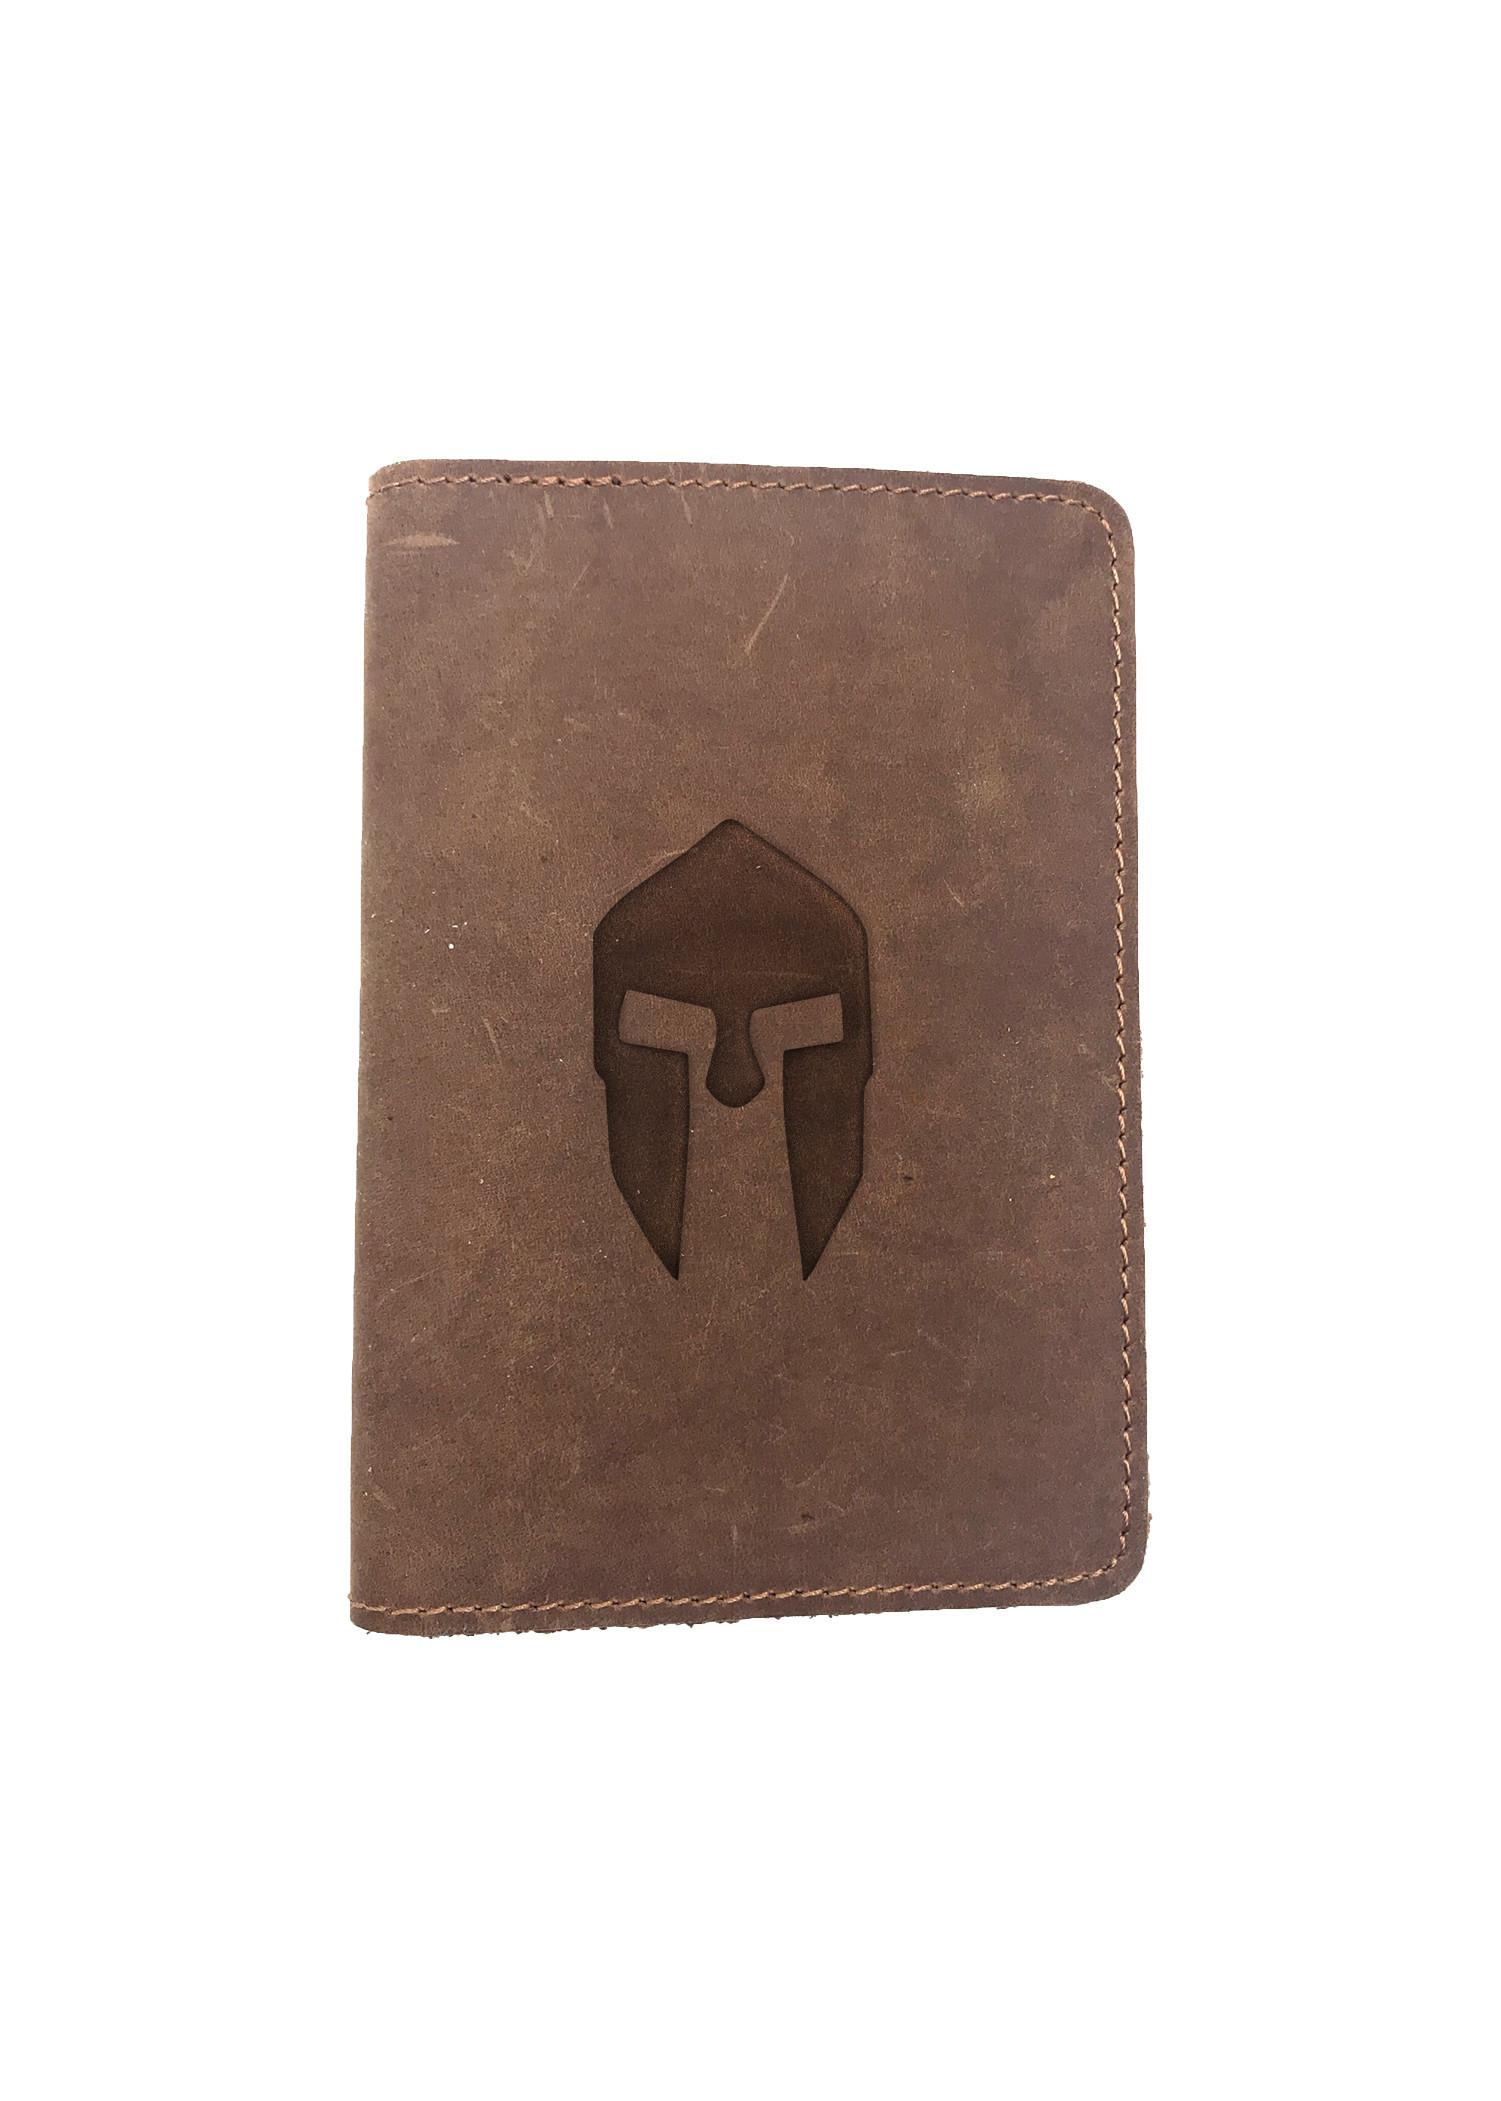 Passport Cover Bao Da Hộ Chiếu Da Sáp Khắc Hình Nón SPARTAN HELMET (BROWN)